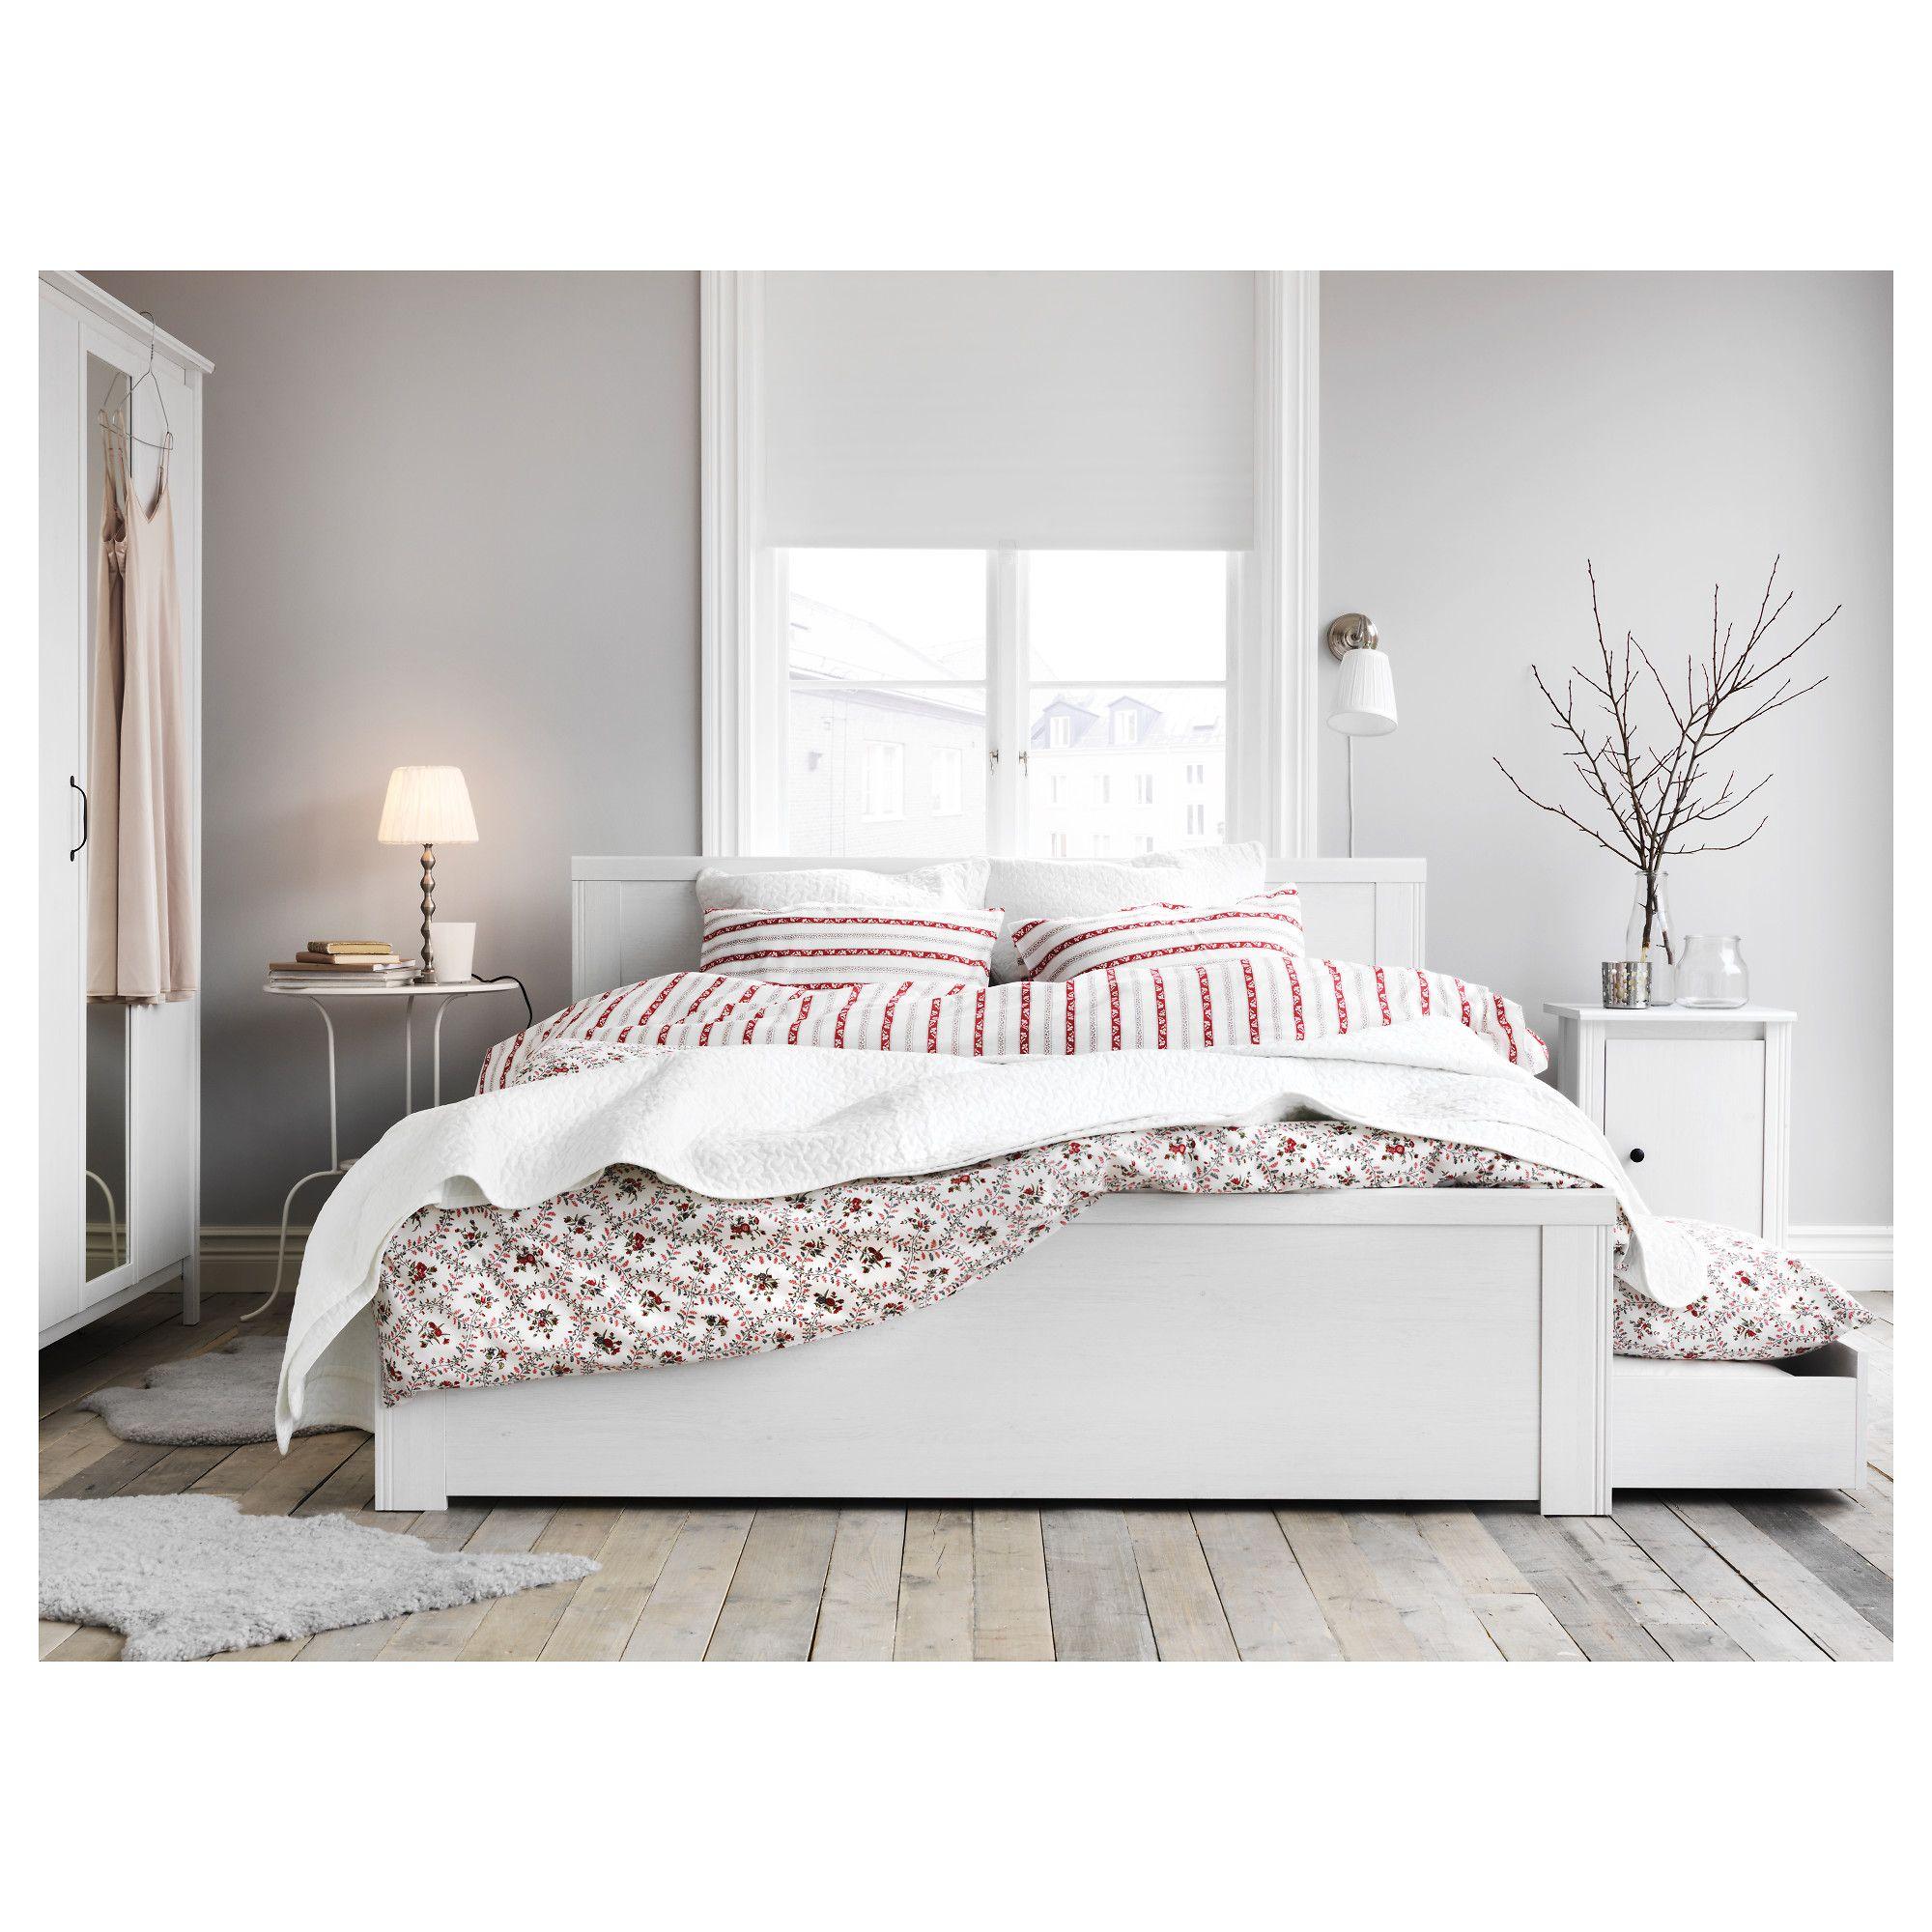 BRUSALI Bed frame with 4 storage boxes Whitelury Standard King